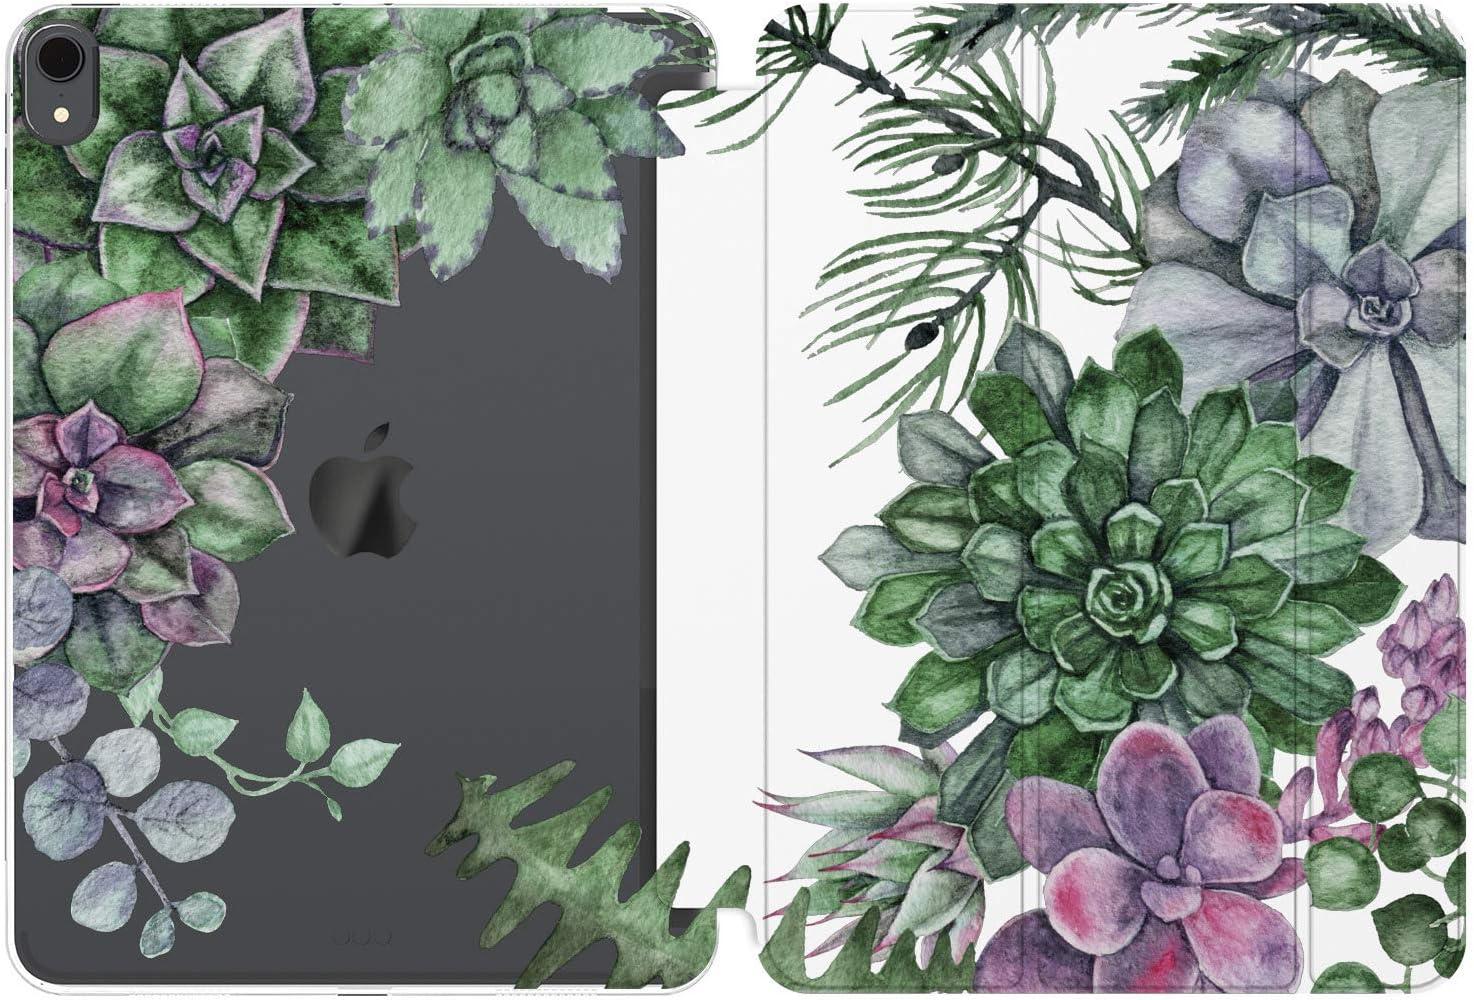 Cavka Case for Apple iPad 10.2 8th Gen 12.9 Pro 11 10.5 9.7 Air 3 Mini 5 4 3 2 1 2019/18 Protective Plants Greenery Watercolor Flowers Succulent Auto Wake Sleep Lightweight Leaf Print